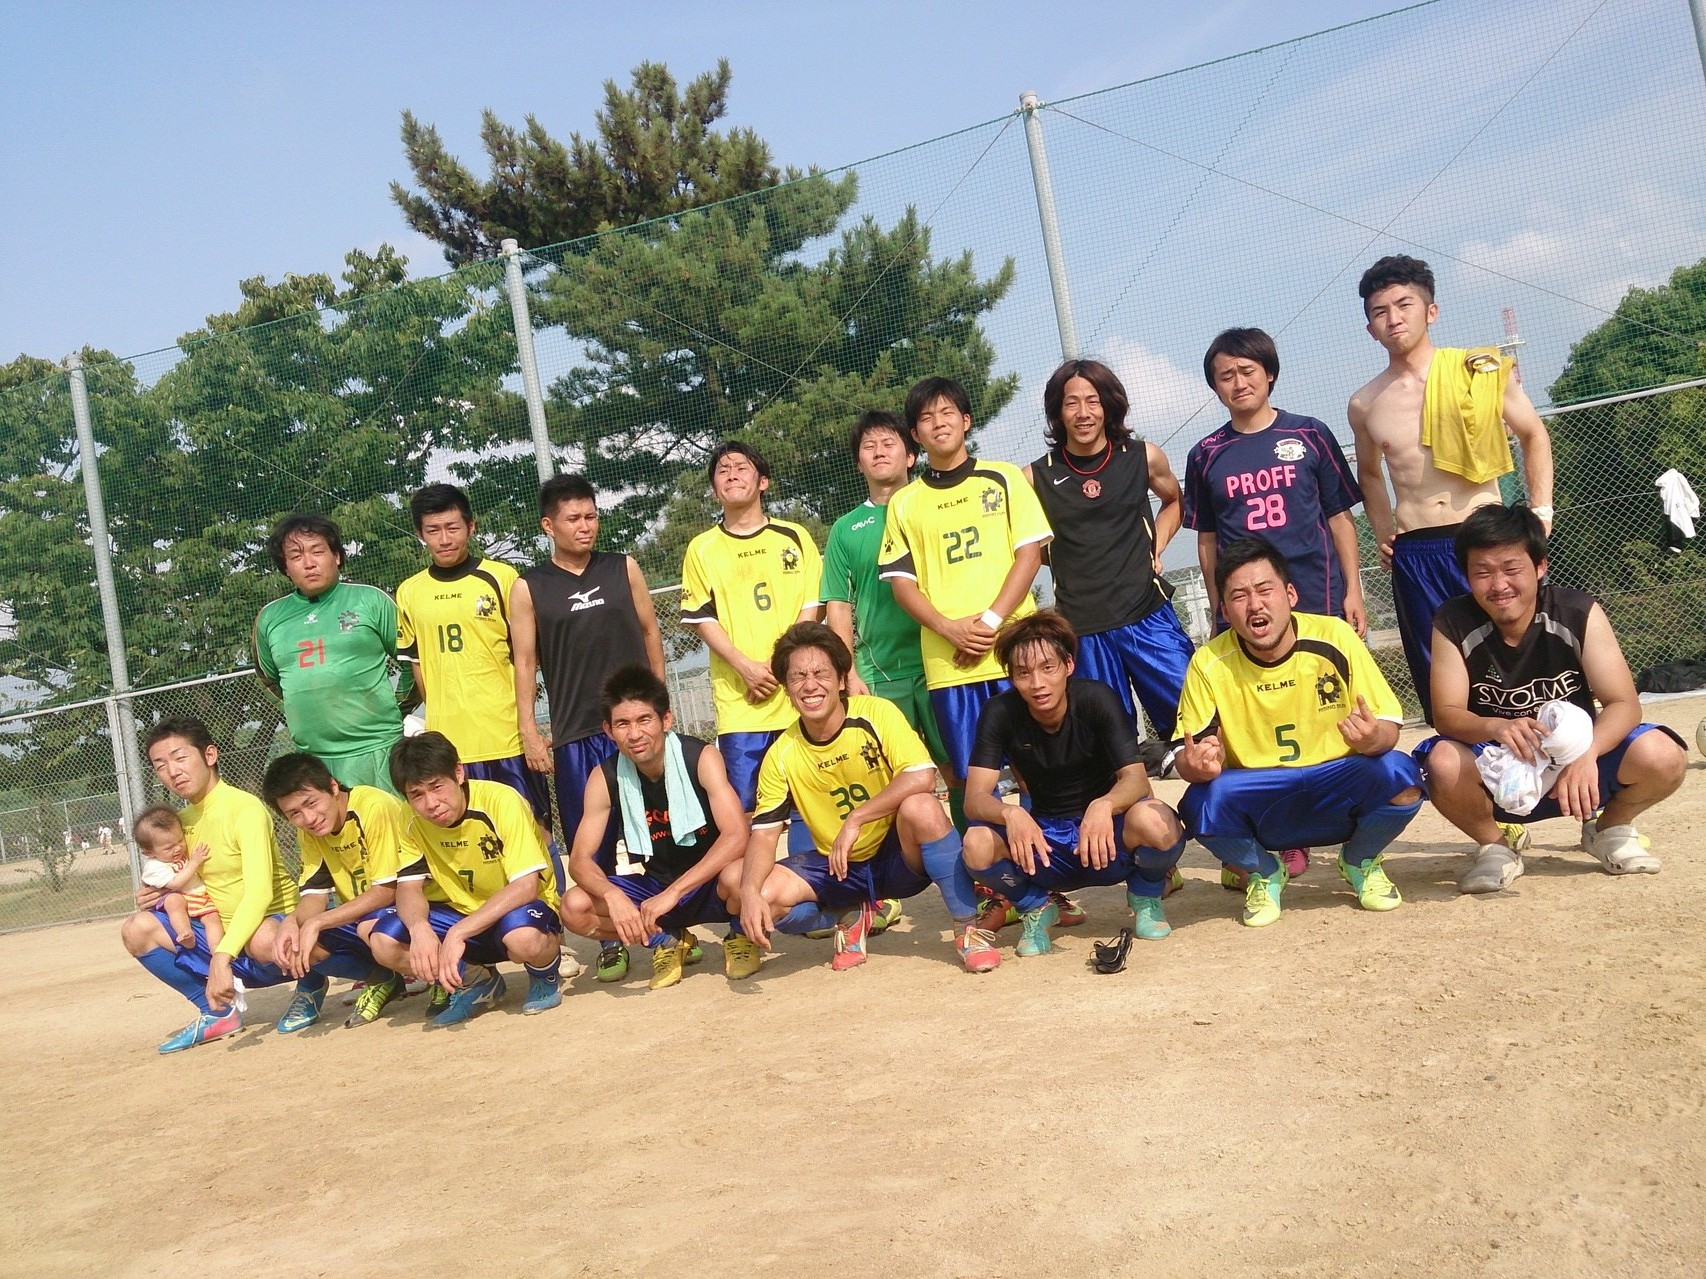 2014/7/27 大阪府リーグ第3節 浜工業公園球技広場 vs 泉陽クラブ